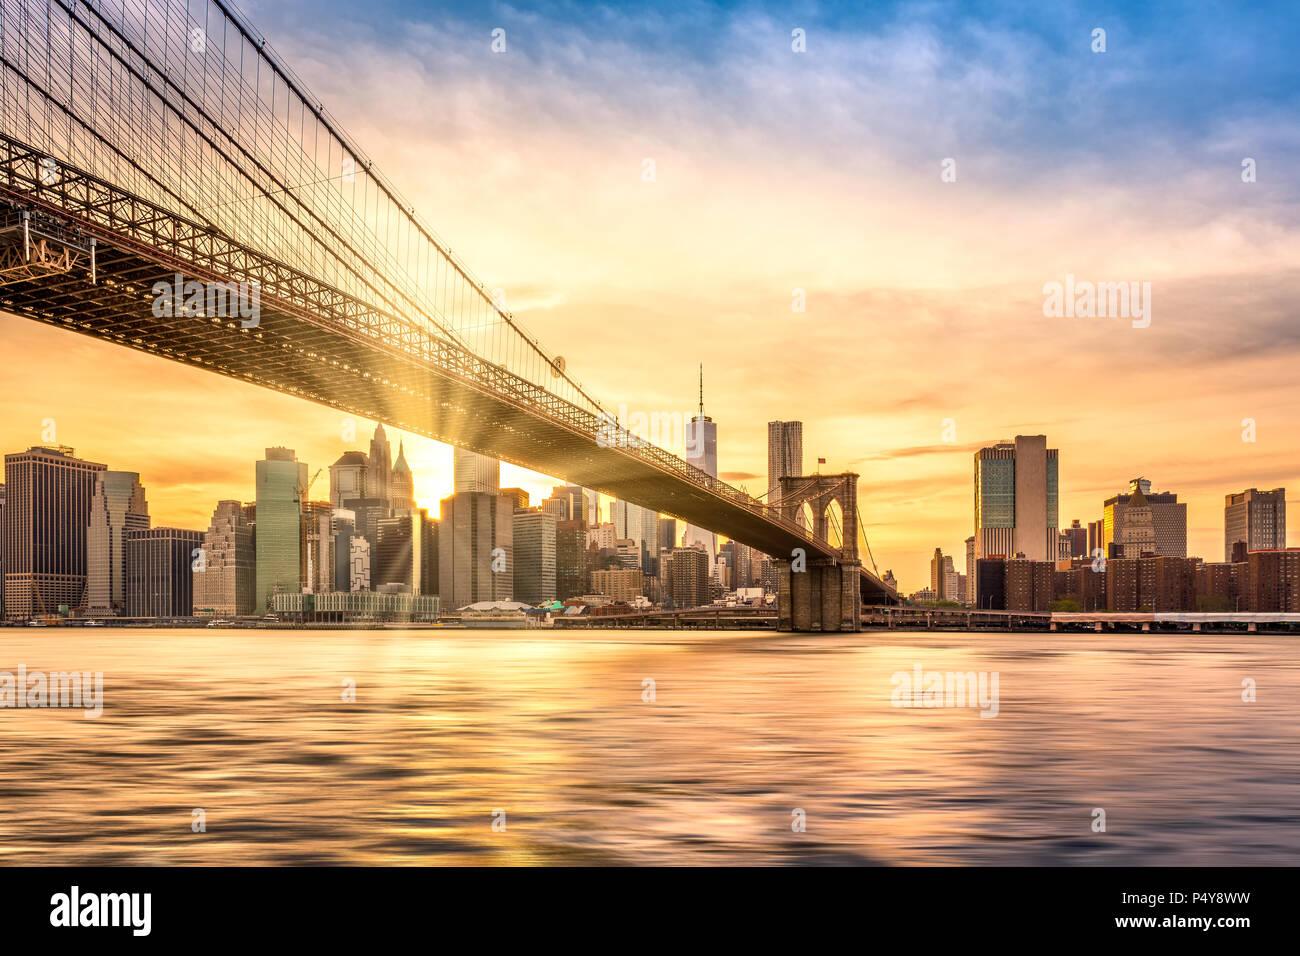 Brooklyn Bridge at sunset viewed from Brooklyn Bridge park, in New York City - Stock Image